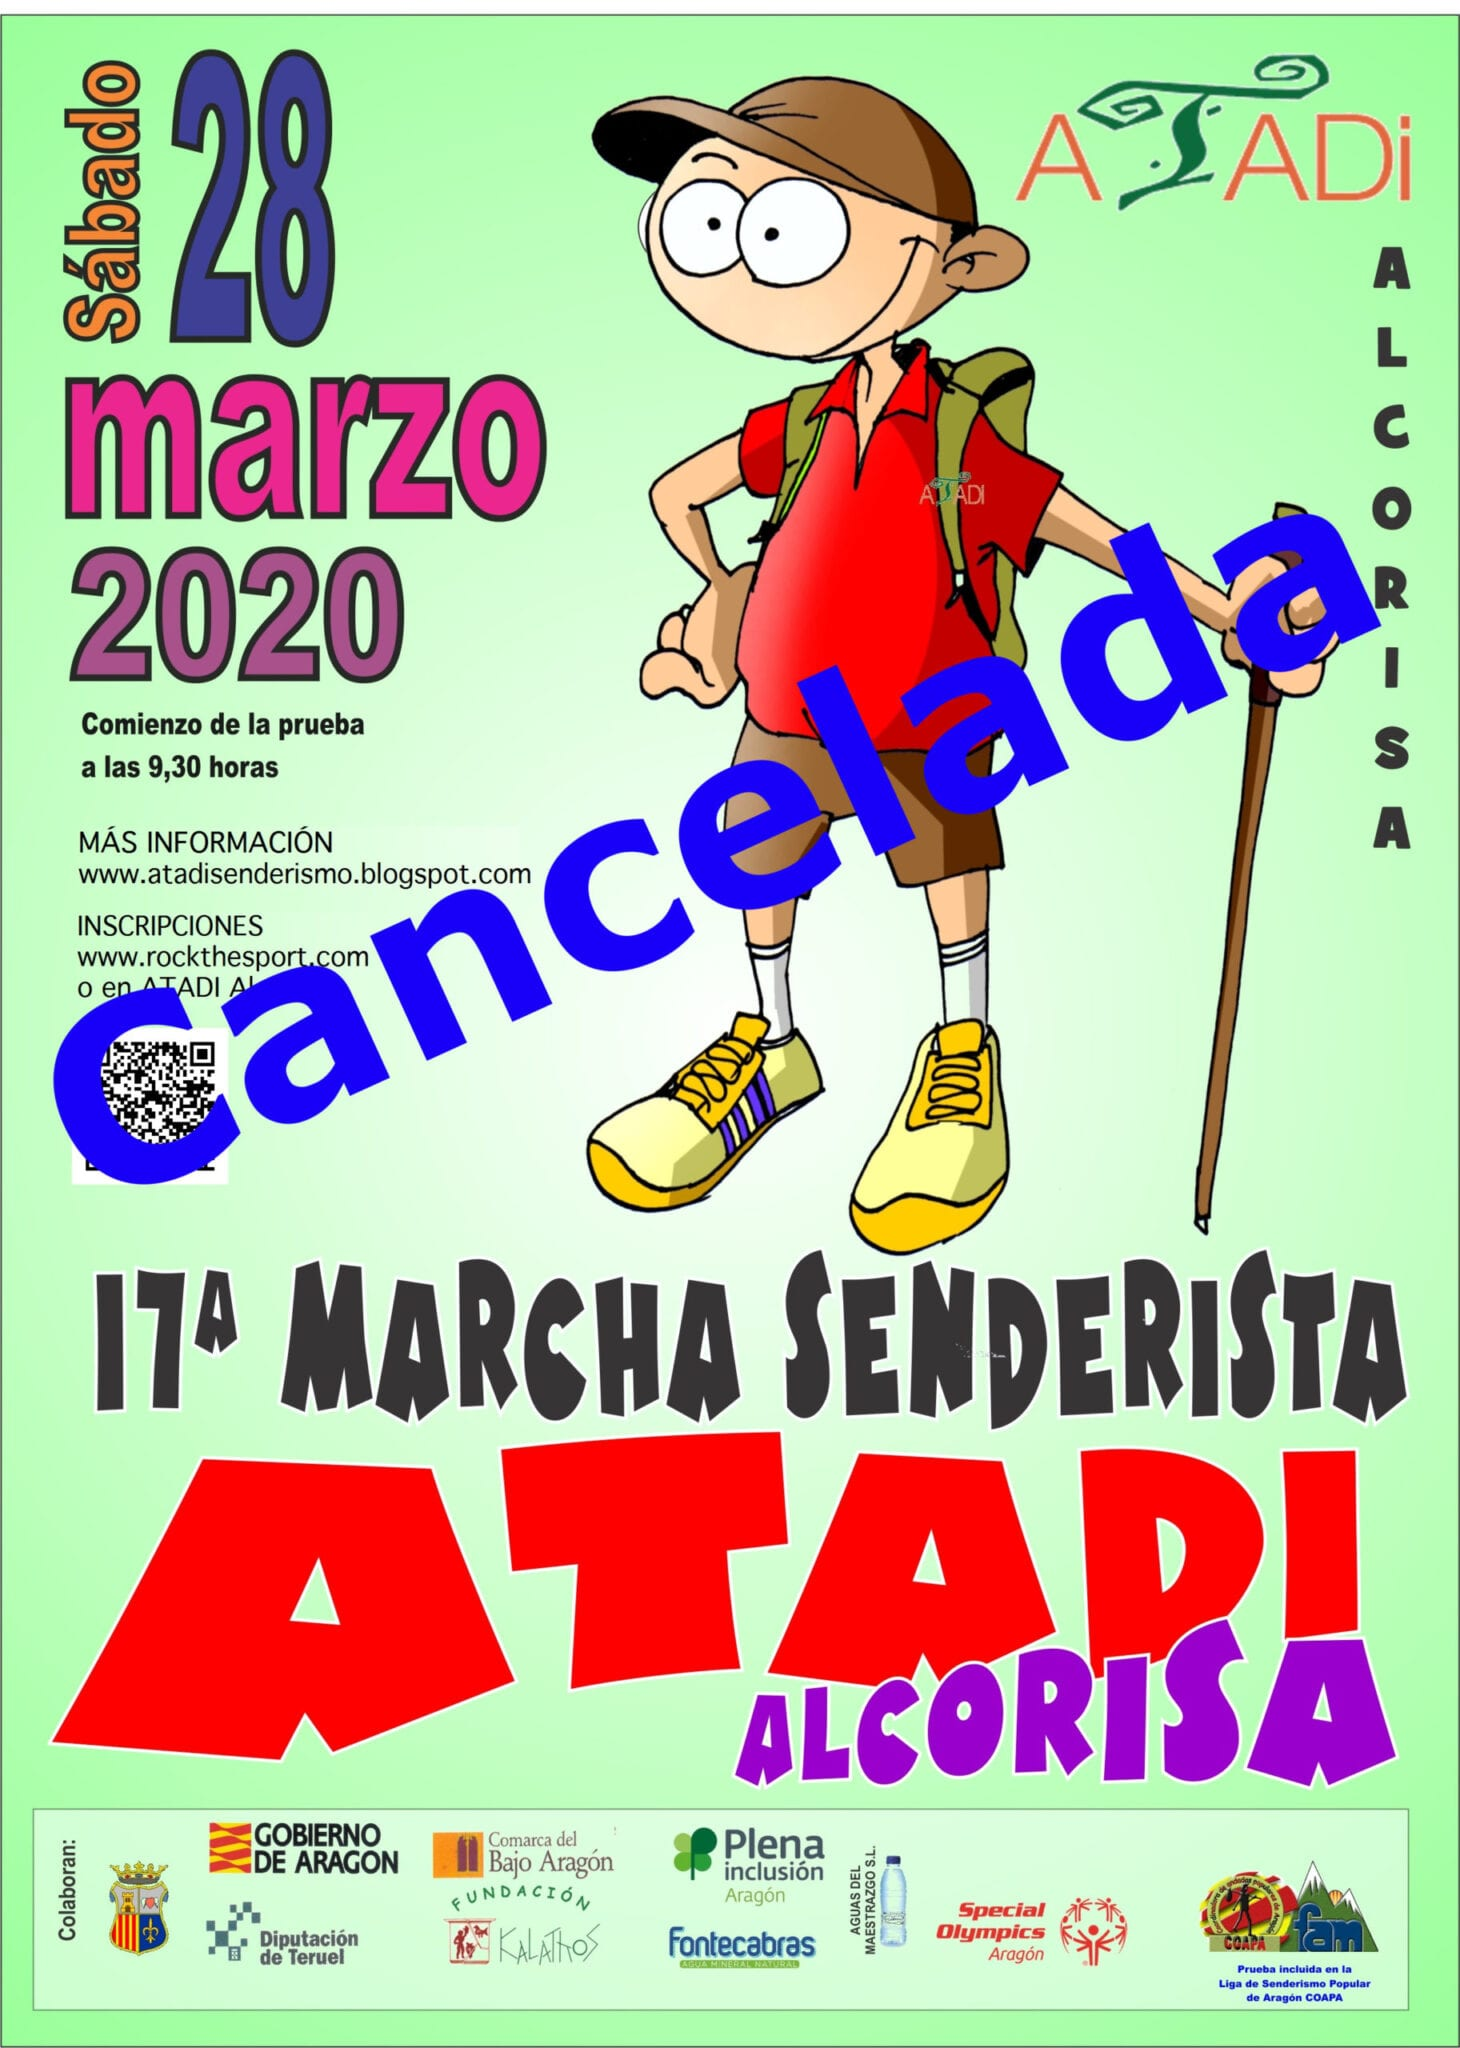 Cancelada marcha senderista